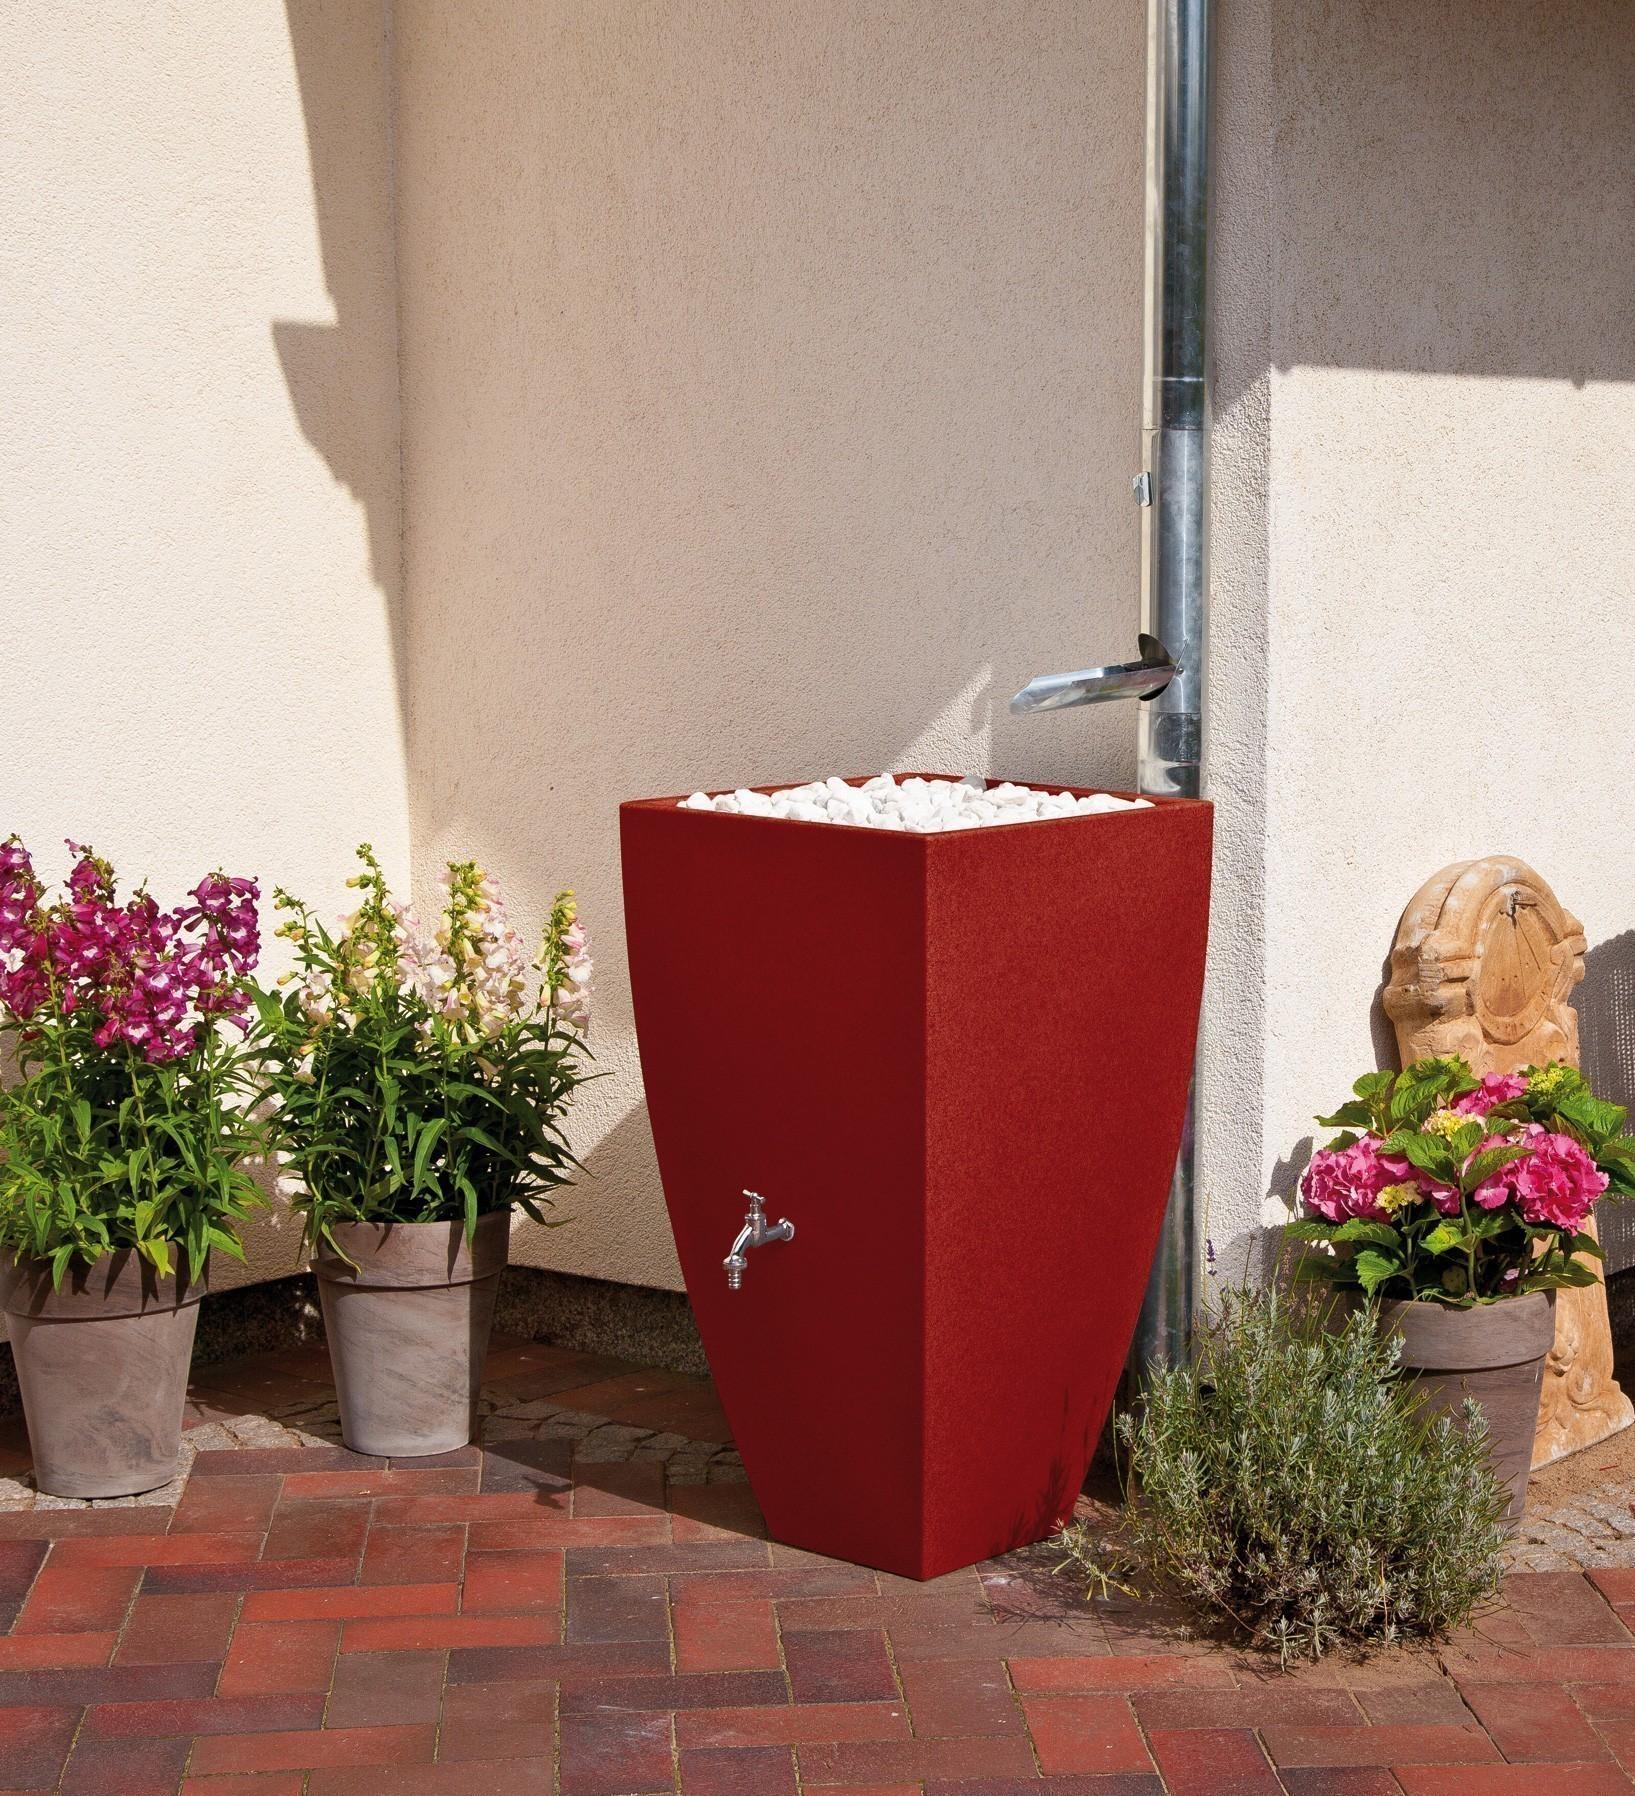 Regentonne / Regenwassertank Premier Tech Aqua Modena 200L rubinrot Bild 1